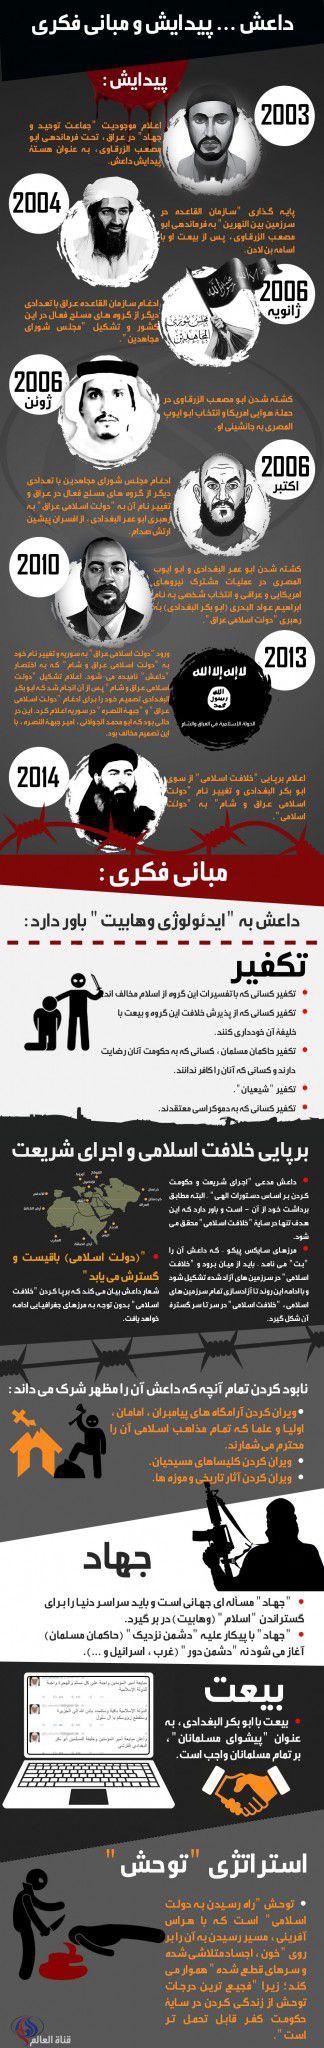 alalam_635899517738303399_25f_4x3